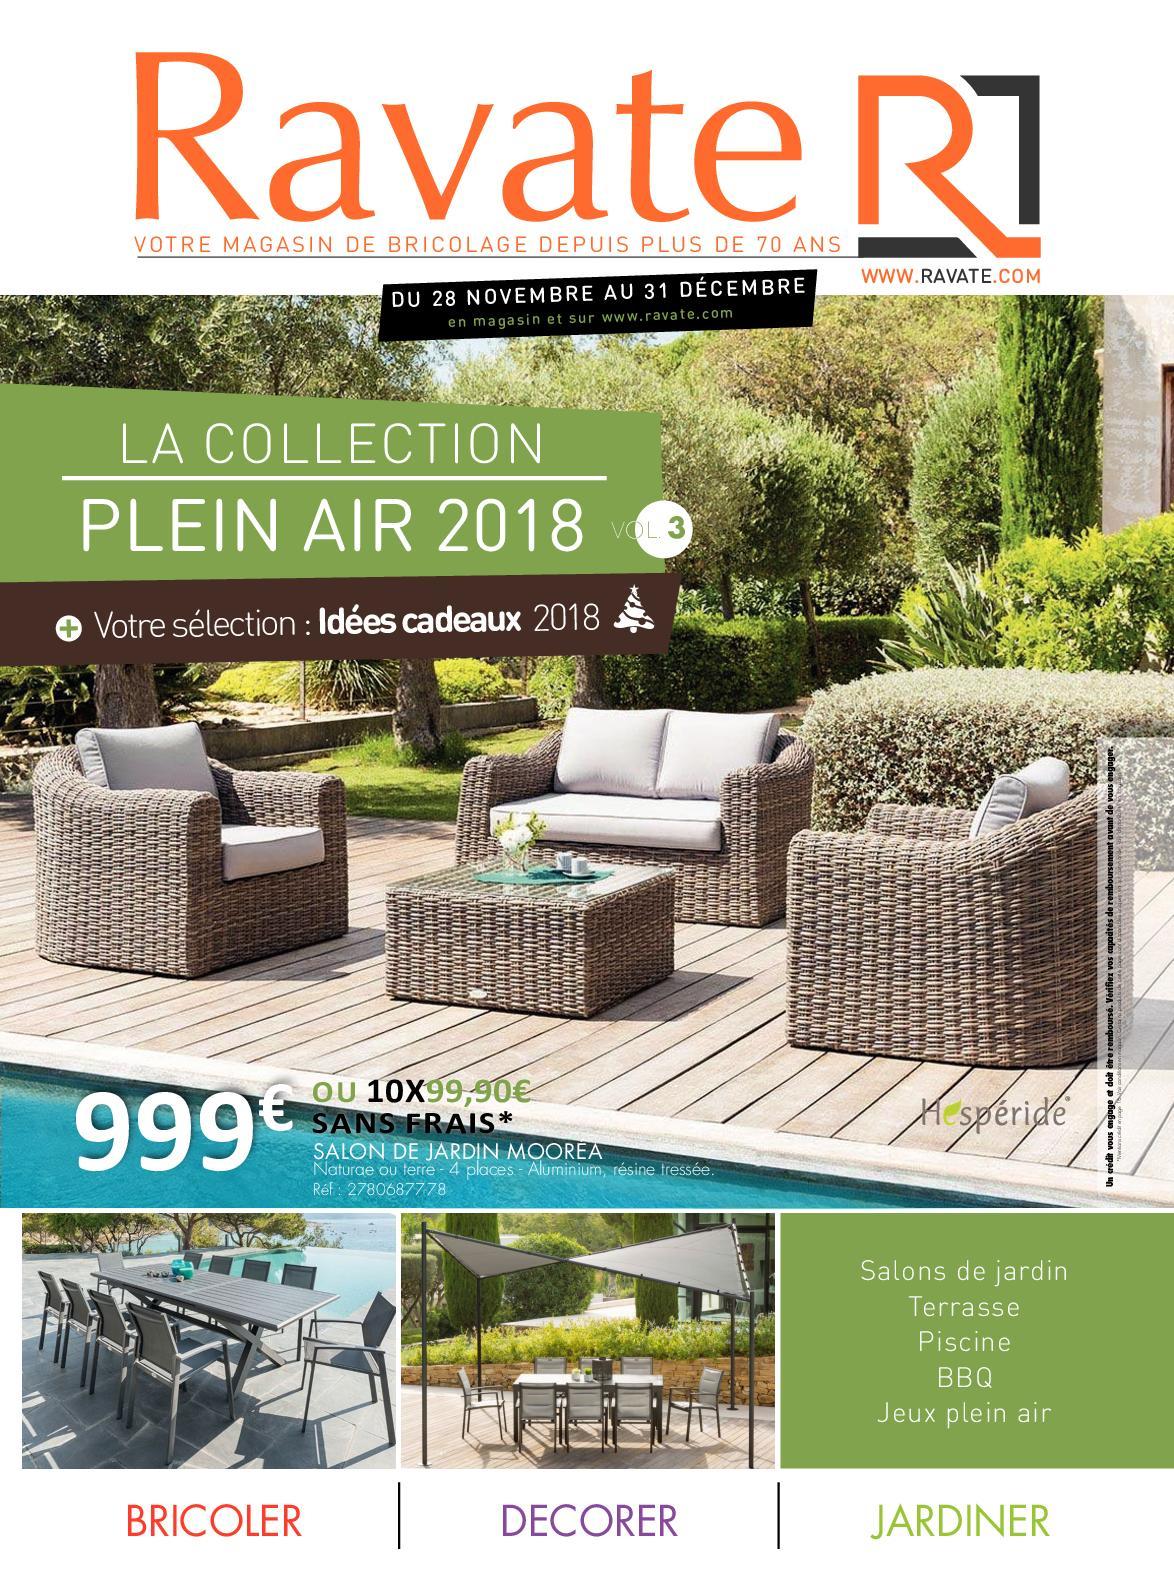 Calaméo - Collection Plein Air 3 Ravate Brico destiné Salon De Jardin Tressé Leclerc